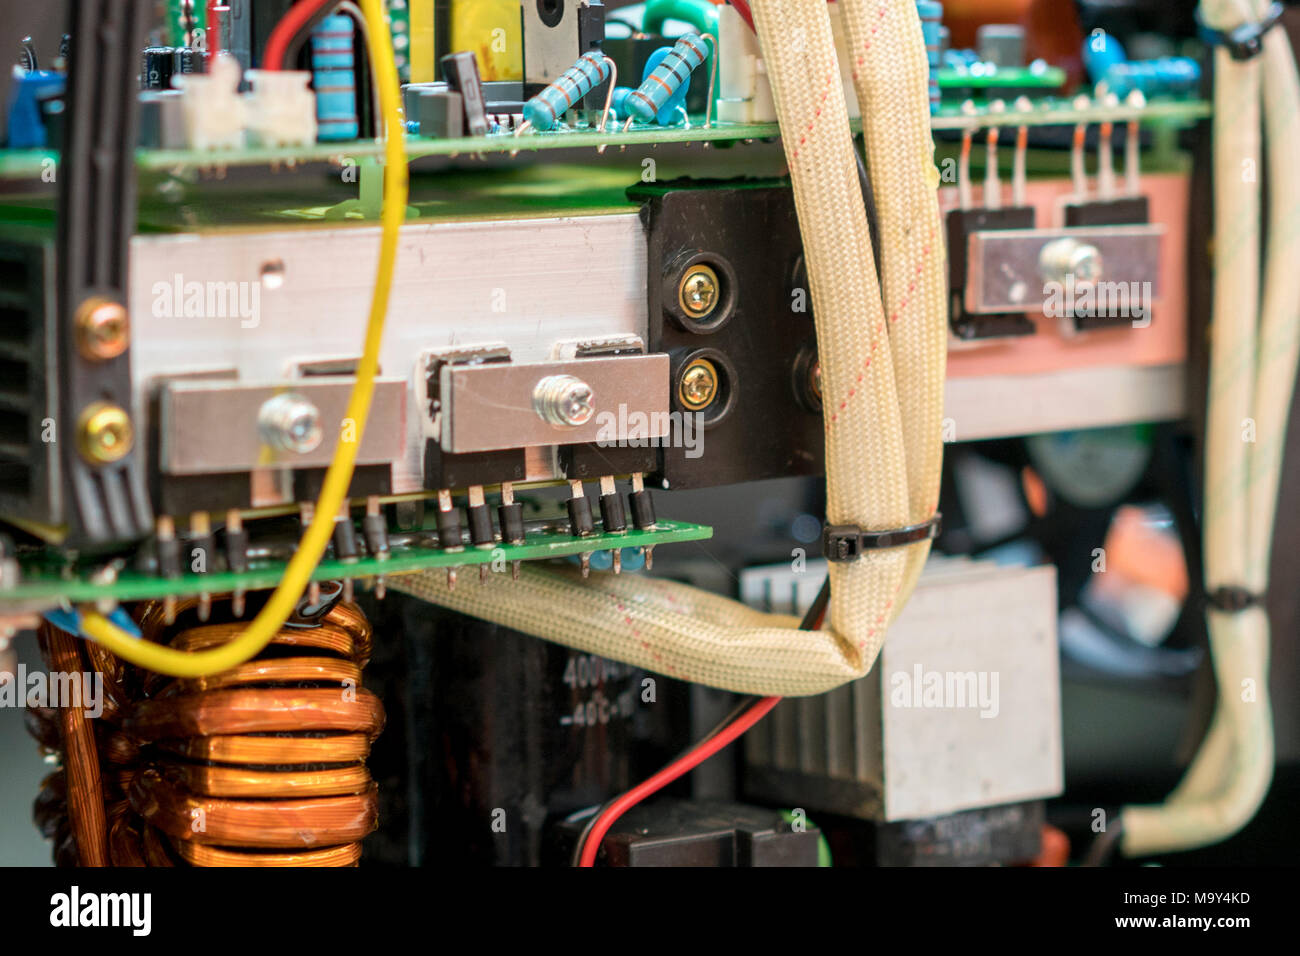 Welding Machine Stock Photos & Welding Machine Stock Images - Alamy